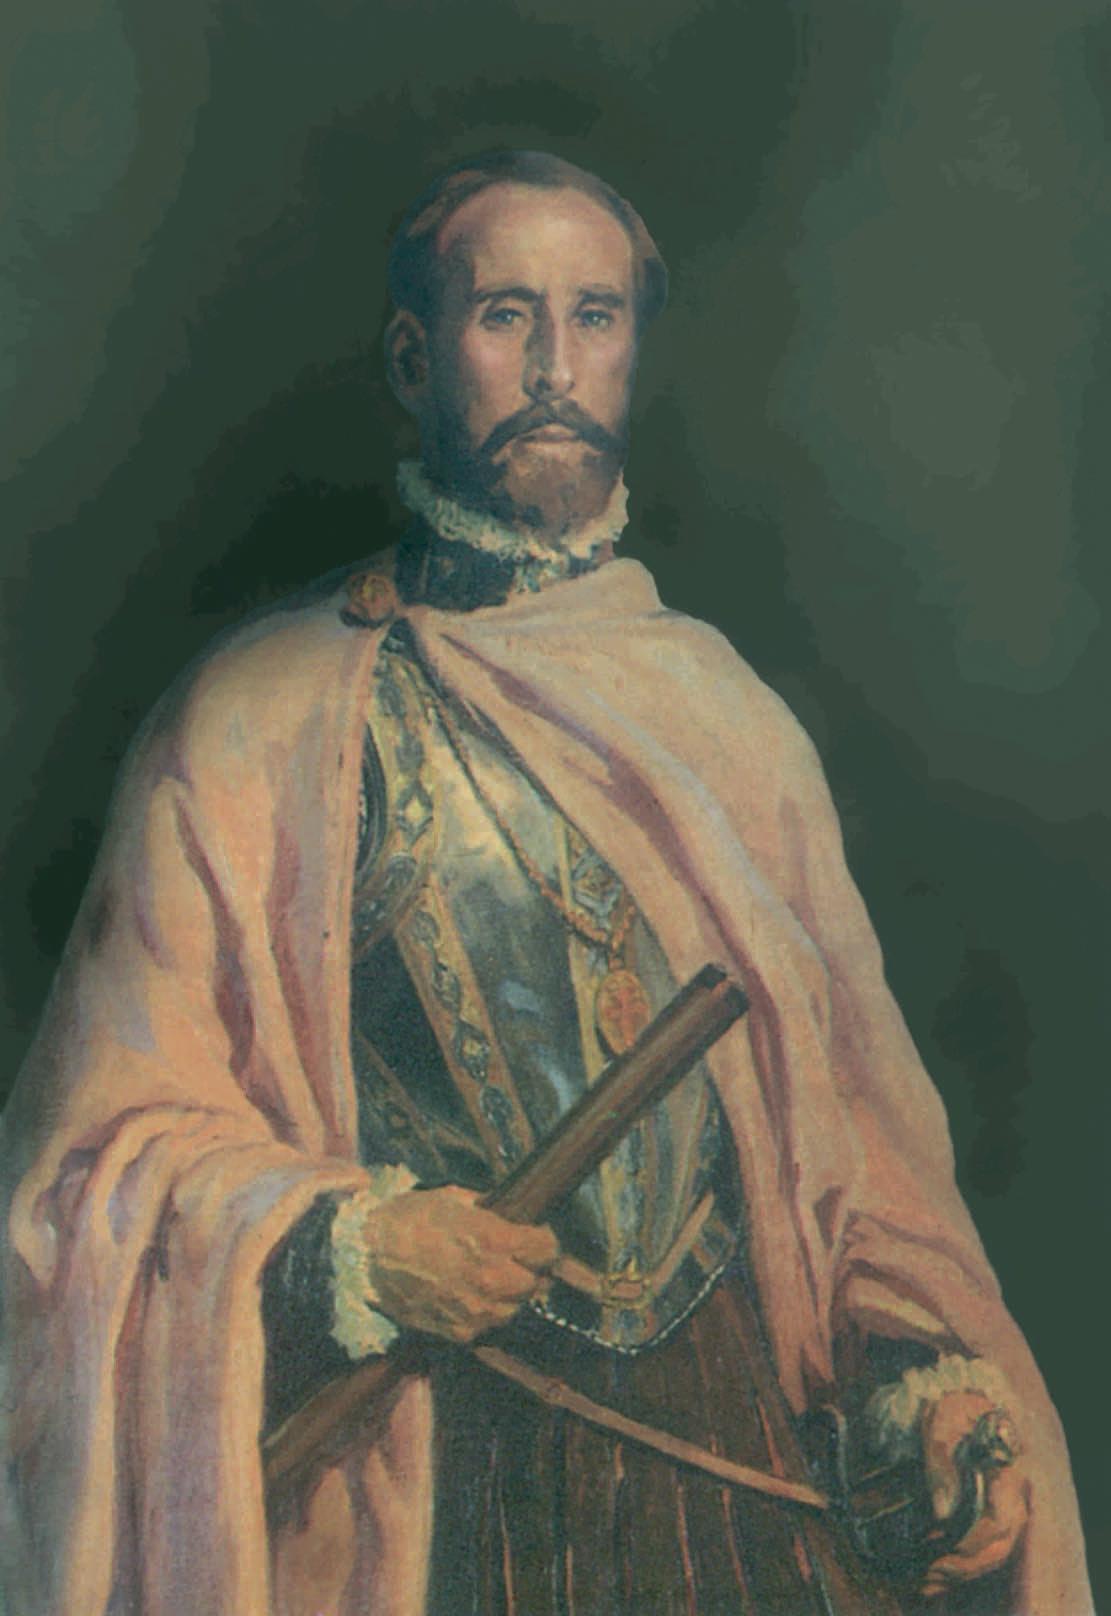 Juan Martínez De Recalde